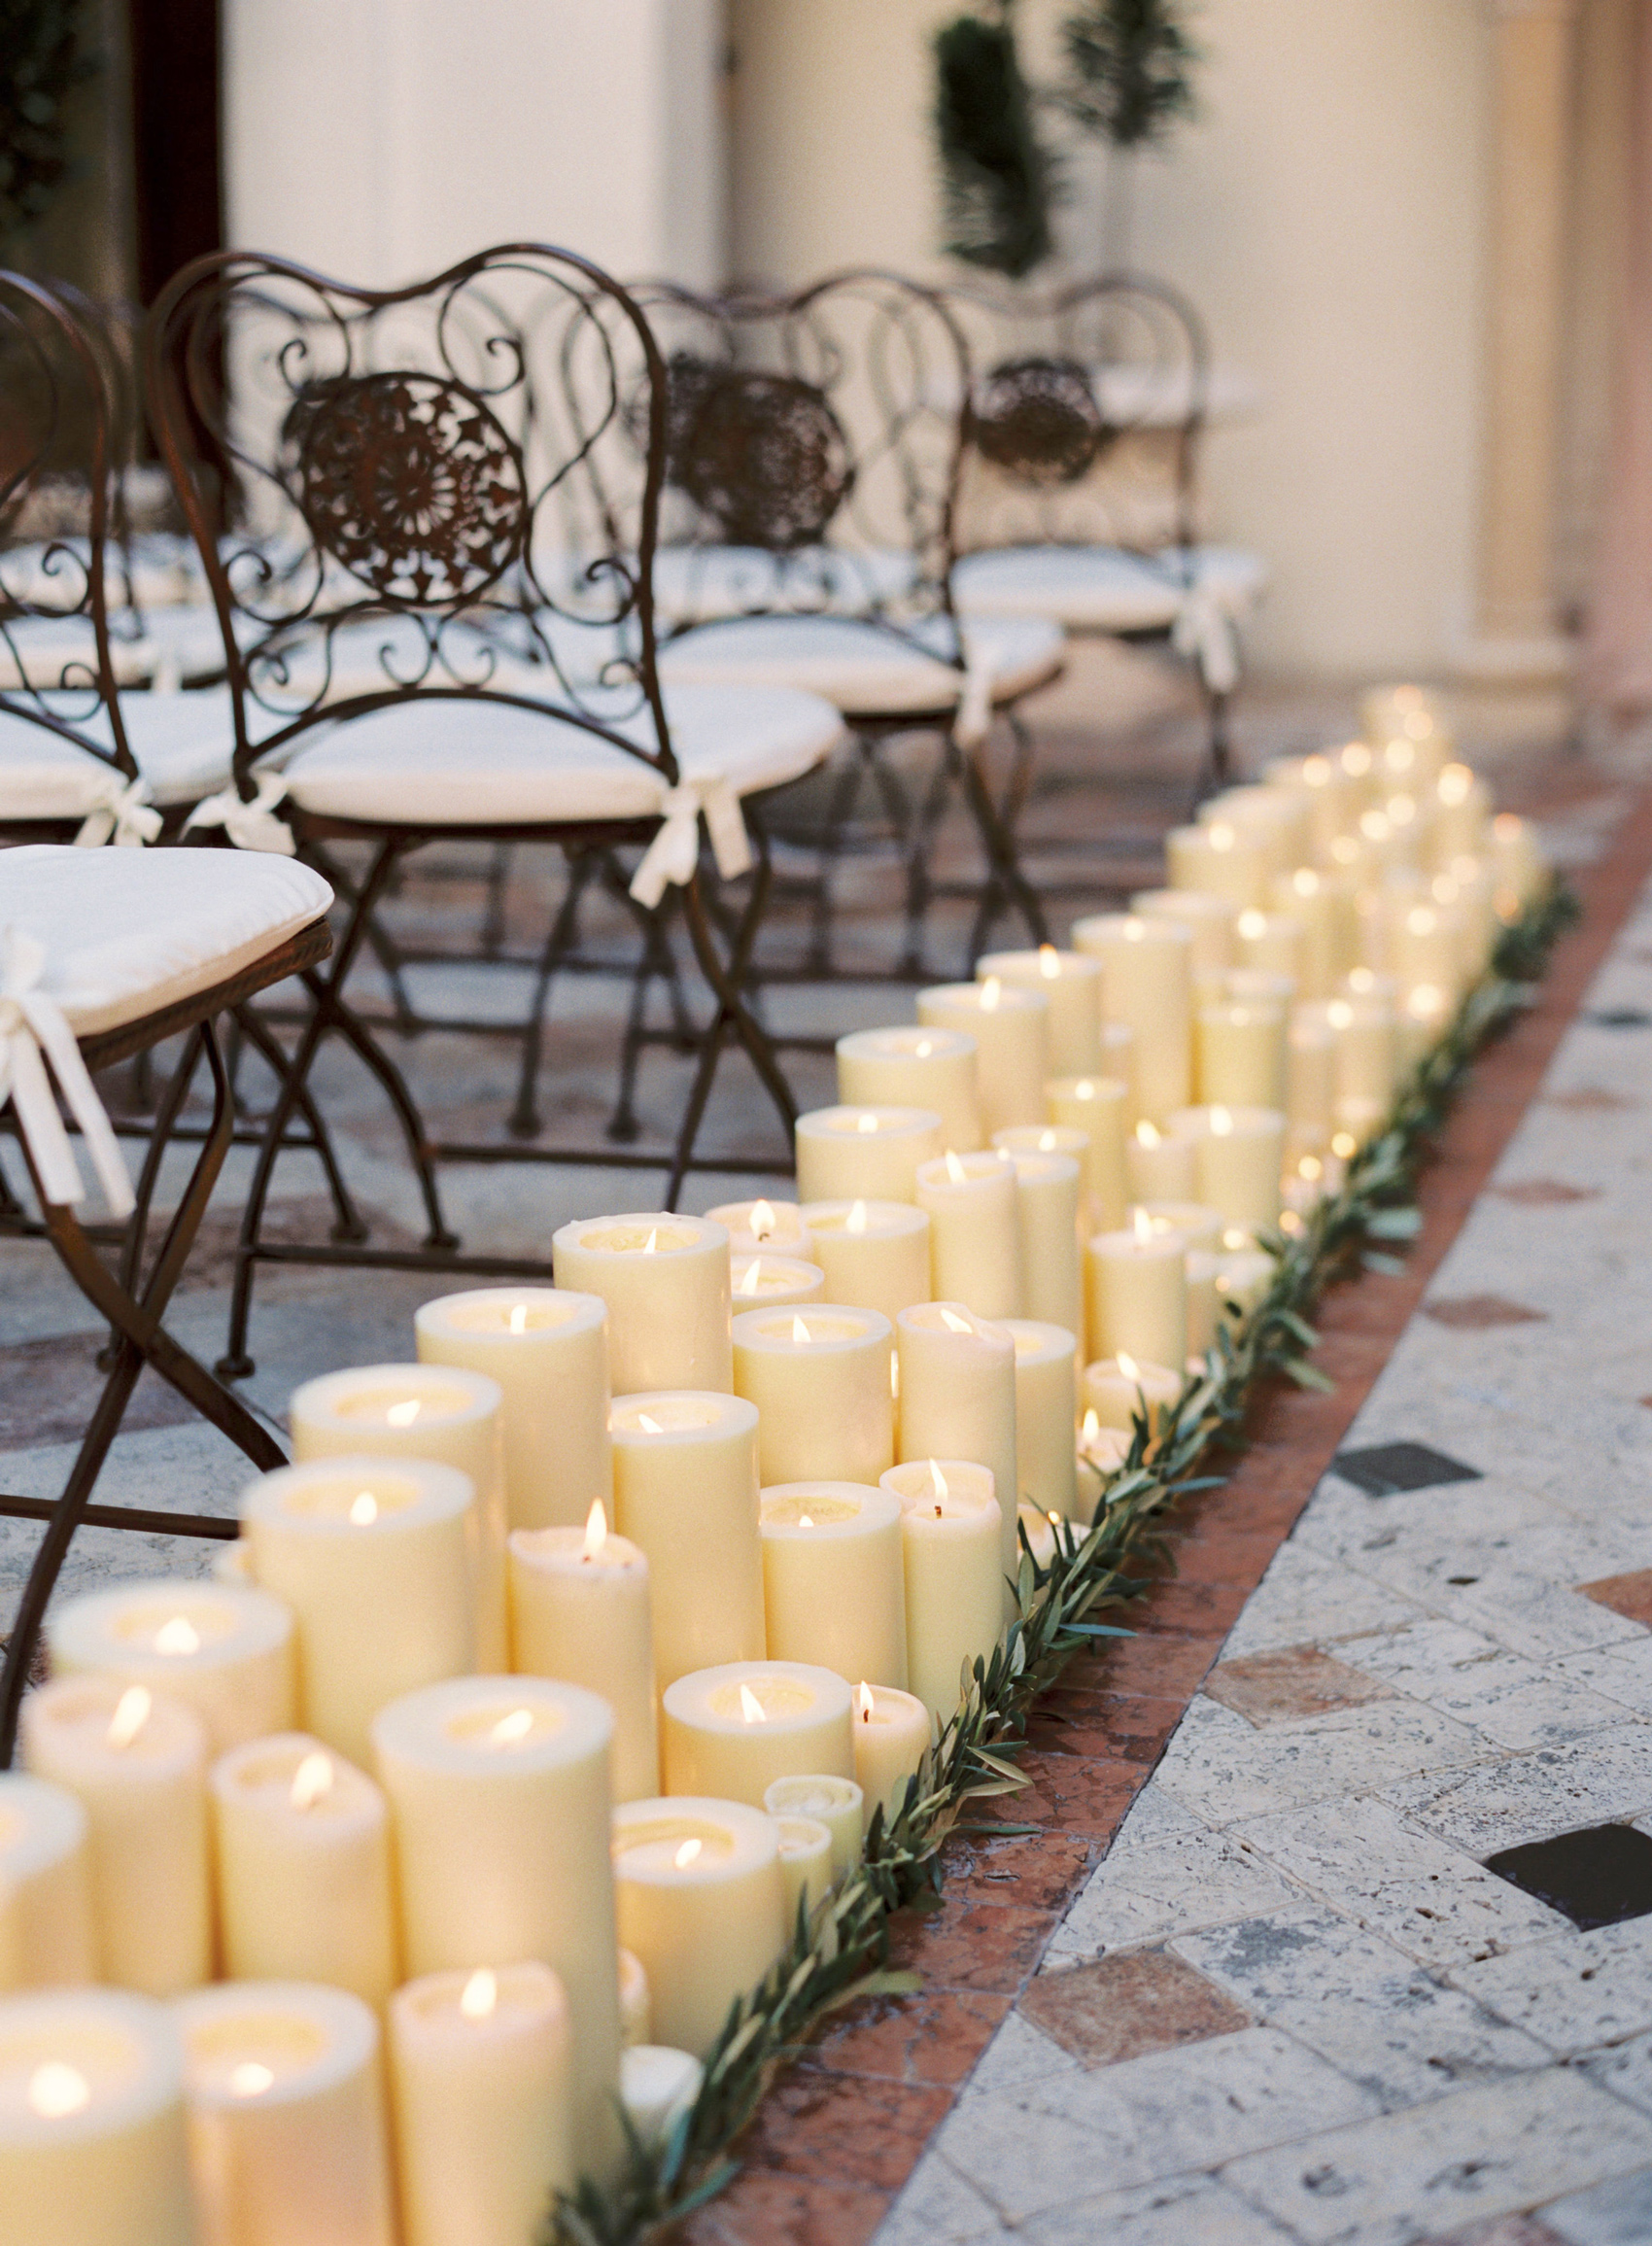 lit pillar candles with greenery lining wedding aisle